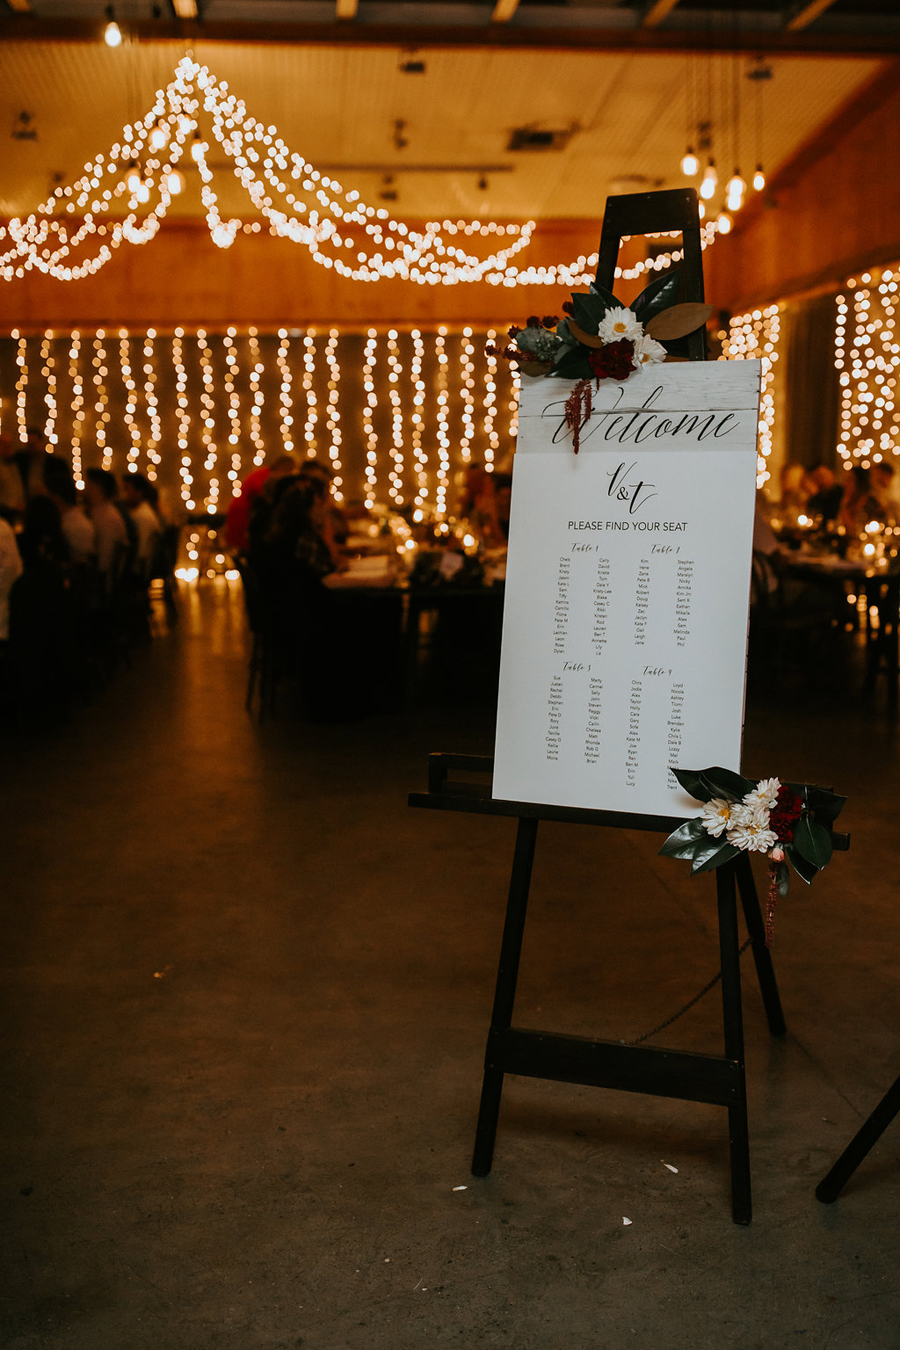 osteria-casuarina-wedding-venue-tweed-coast-weddings-coastal-garden-reception-real-wedding047.jpg